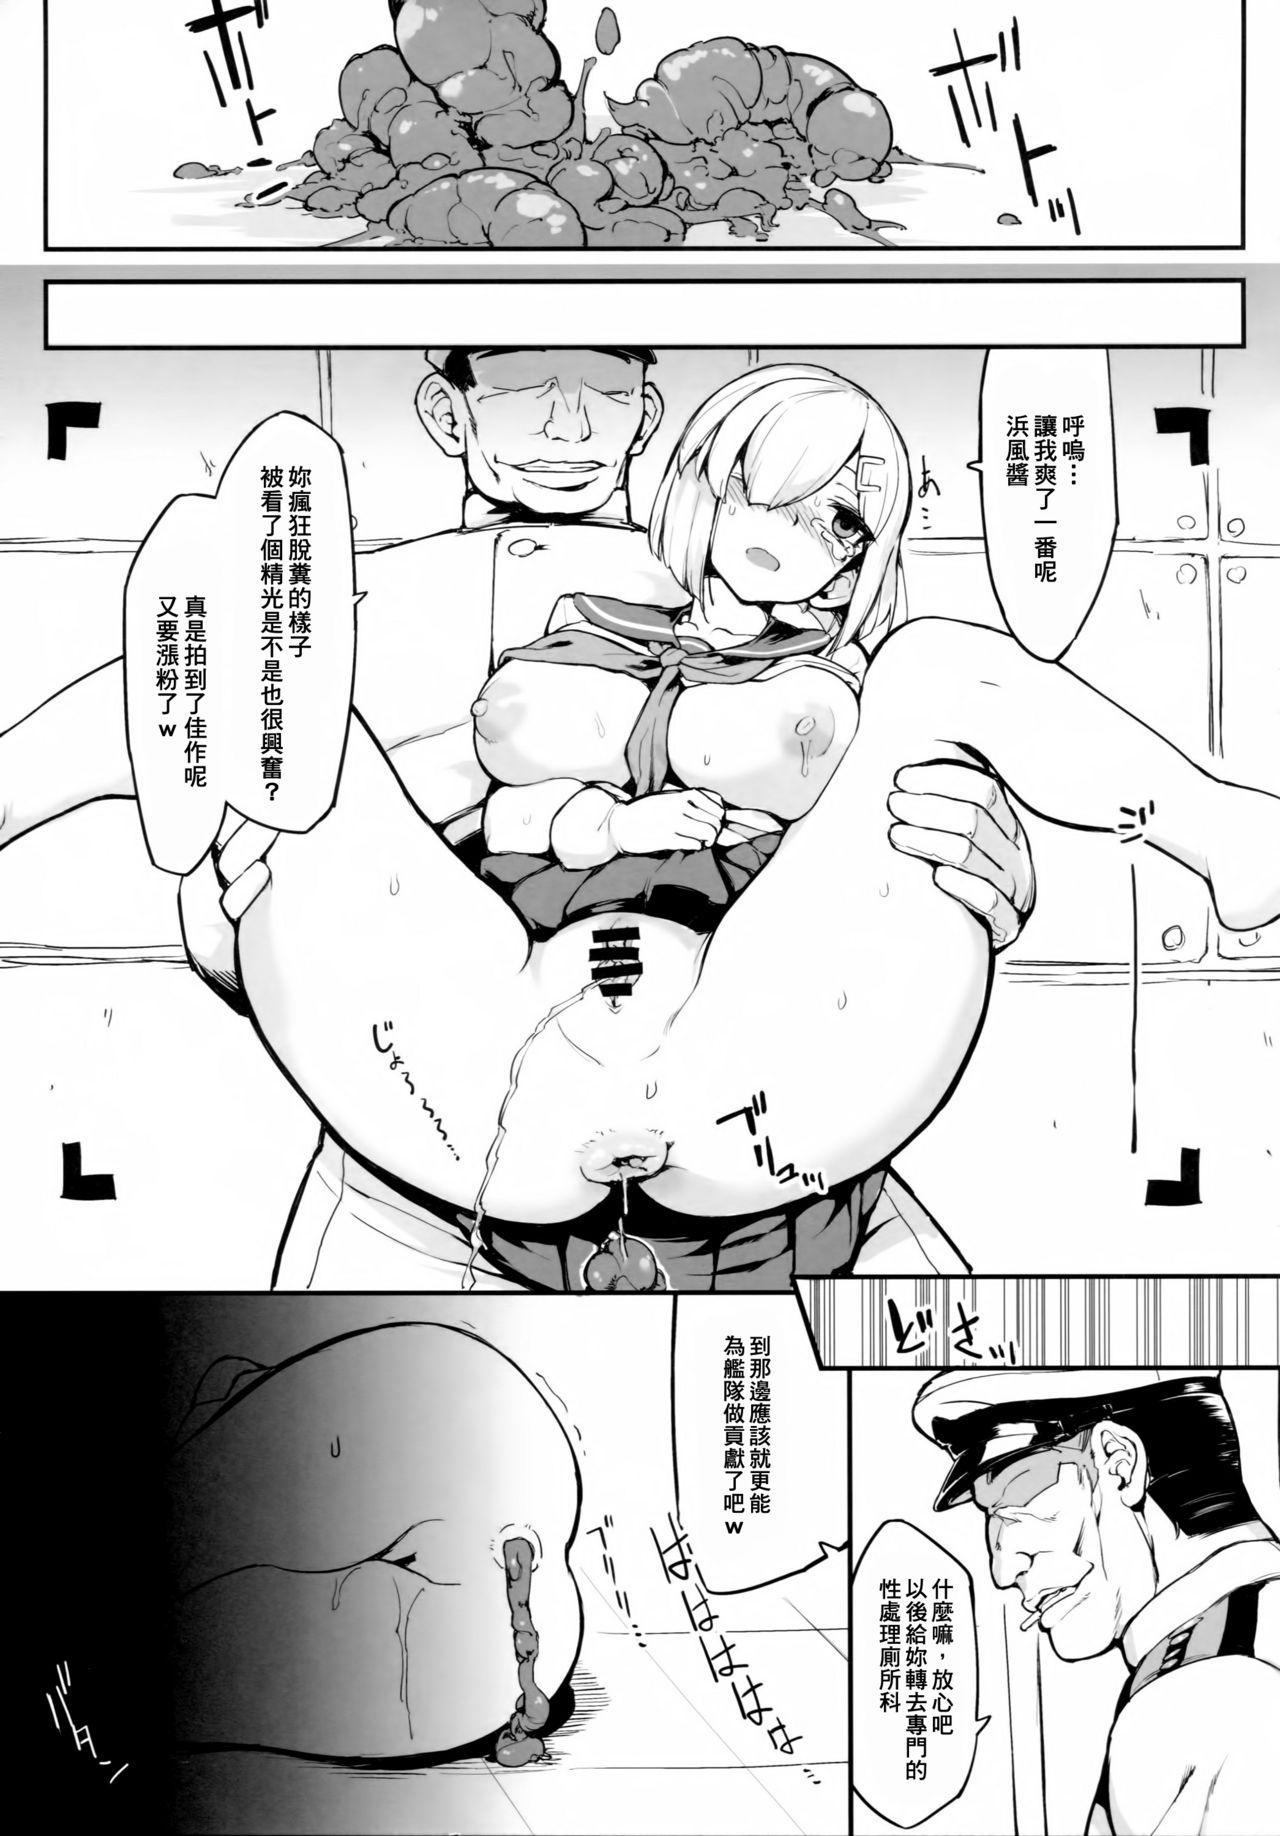 KanColle Haisetsu Sex Goudoushi LoveSca! Goudou Enshuu!! | 艦C排泄性交合同誌 激情糞便! 聯合演習!! 56